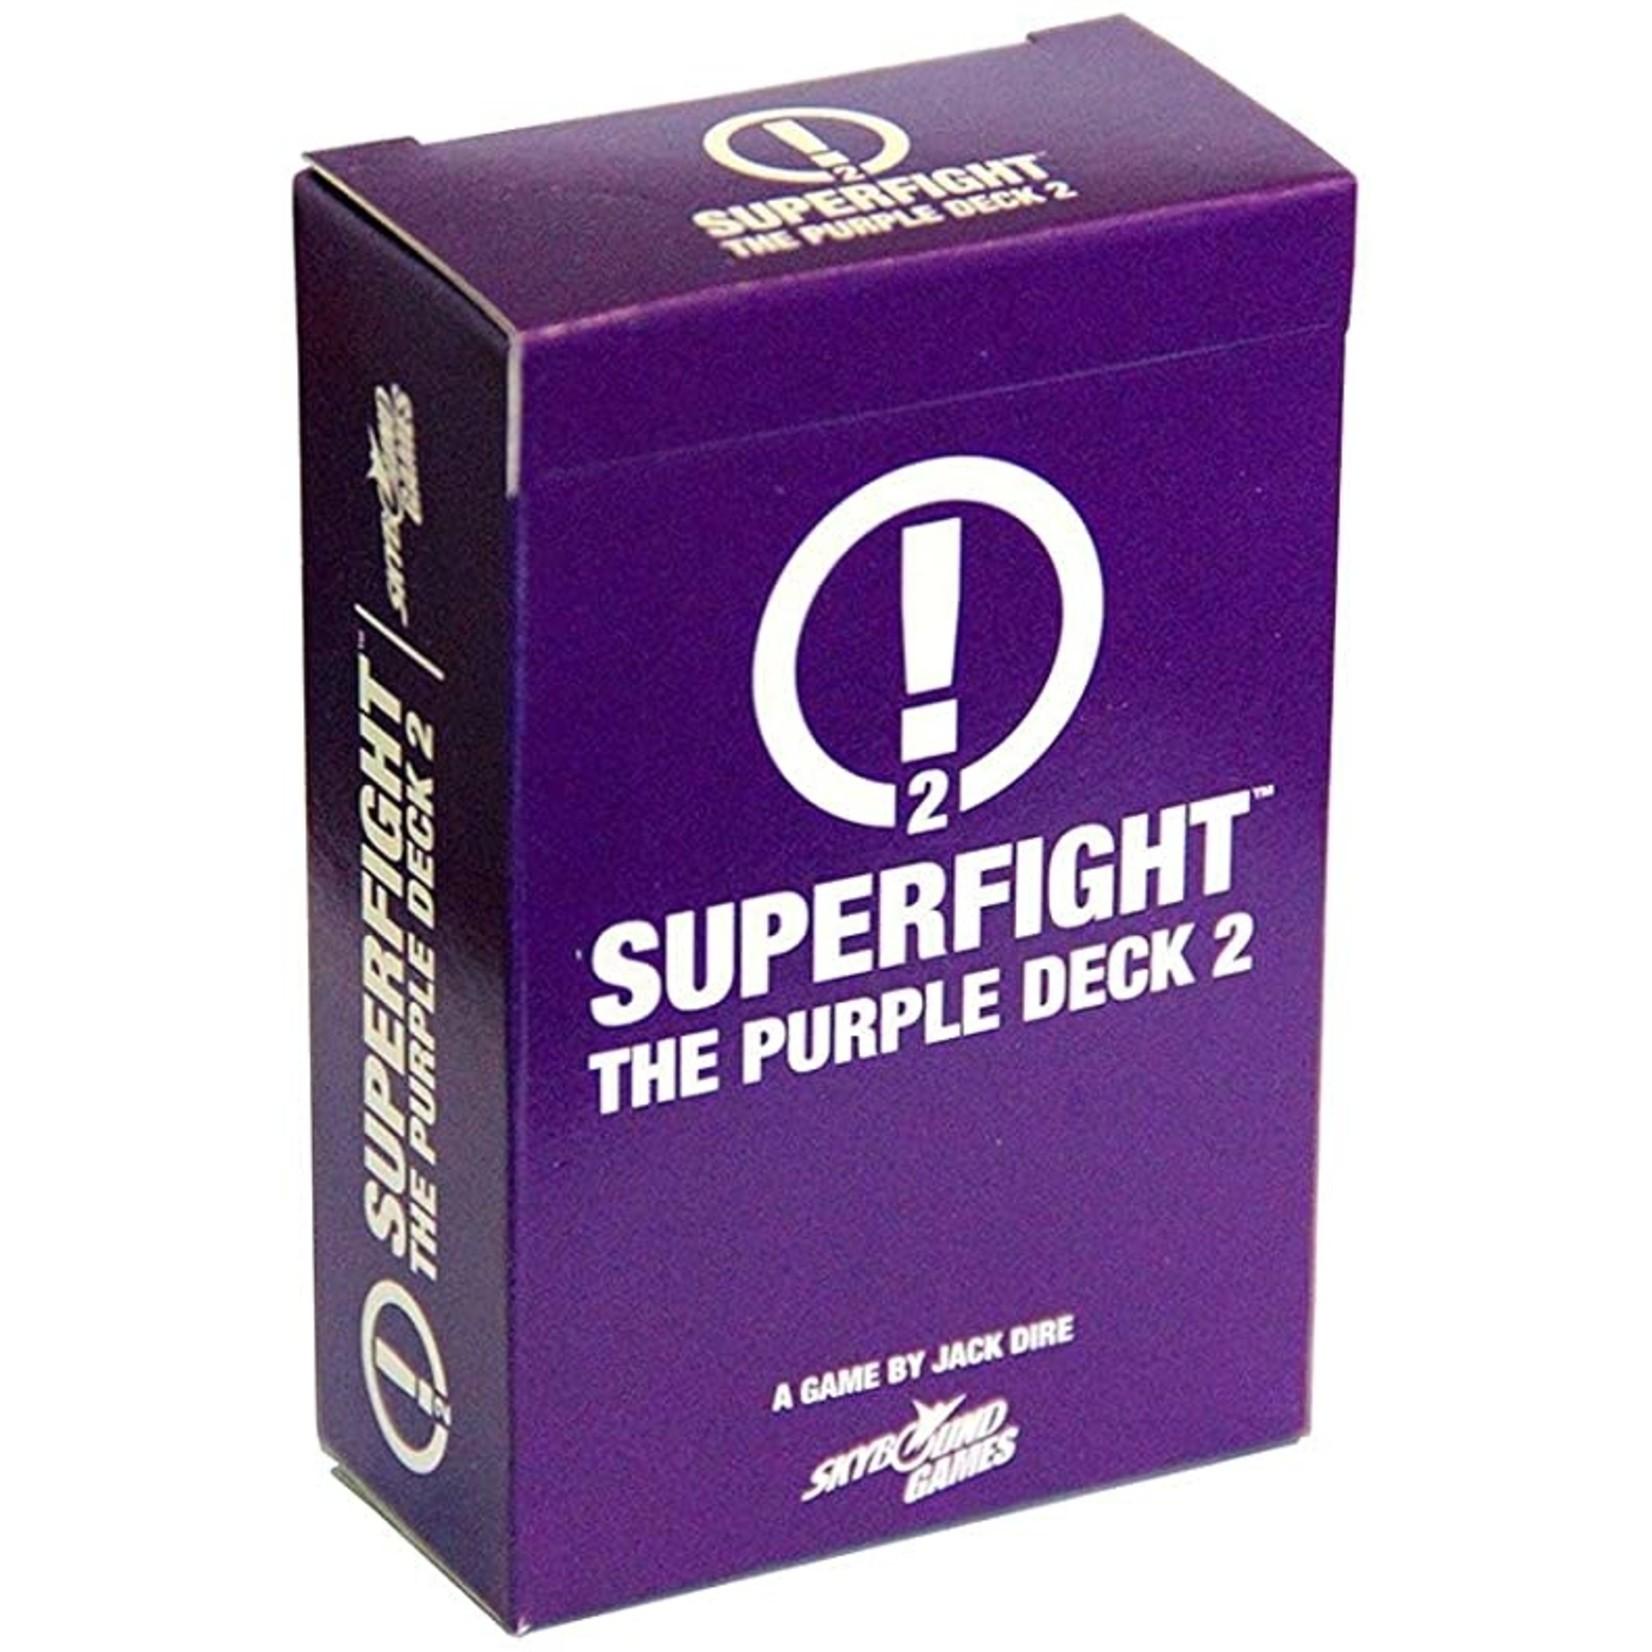 Superfight The Purple Deck 2